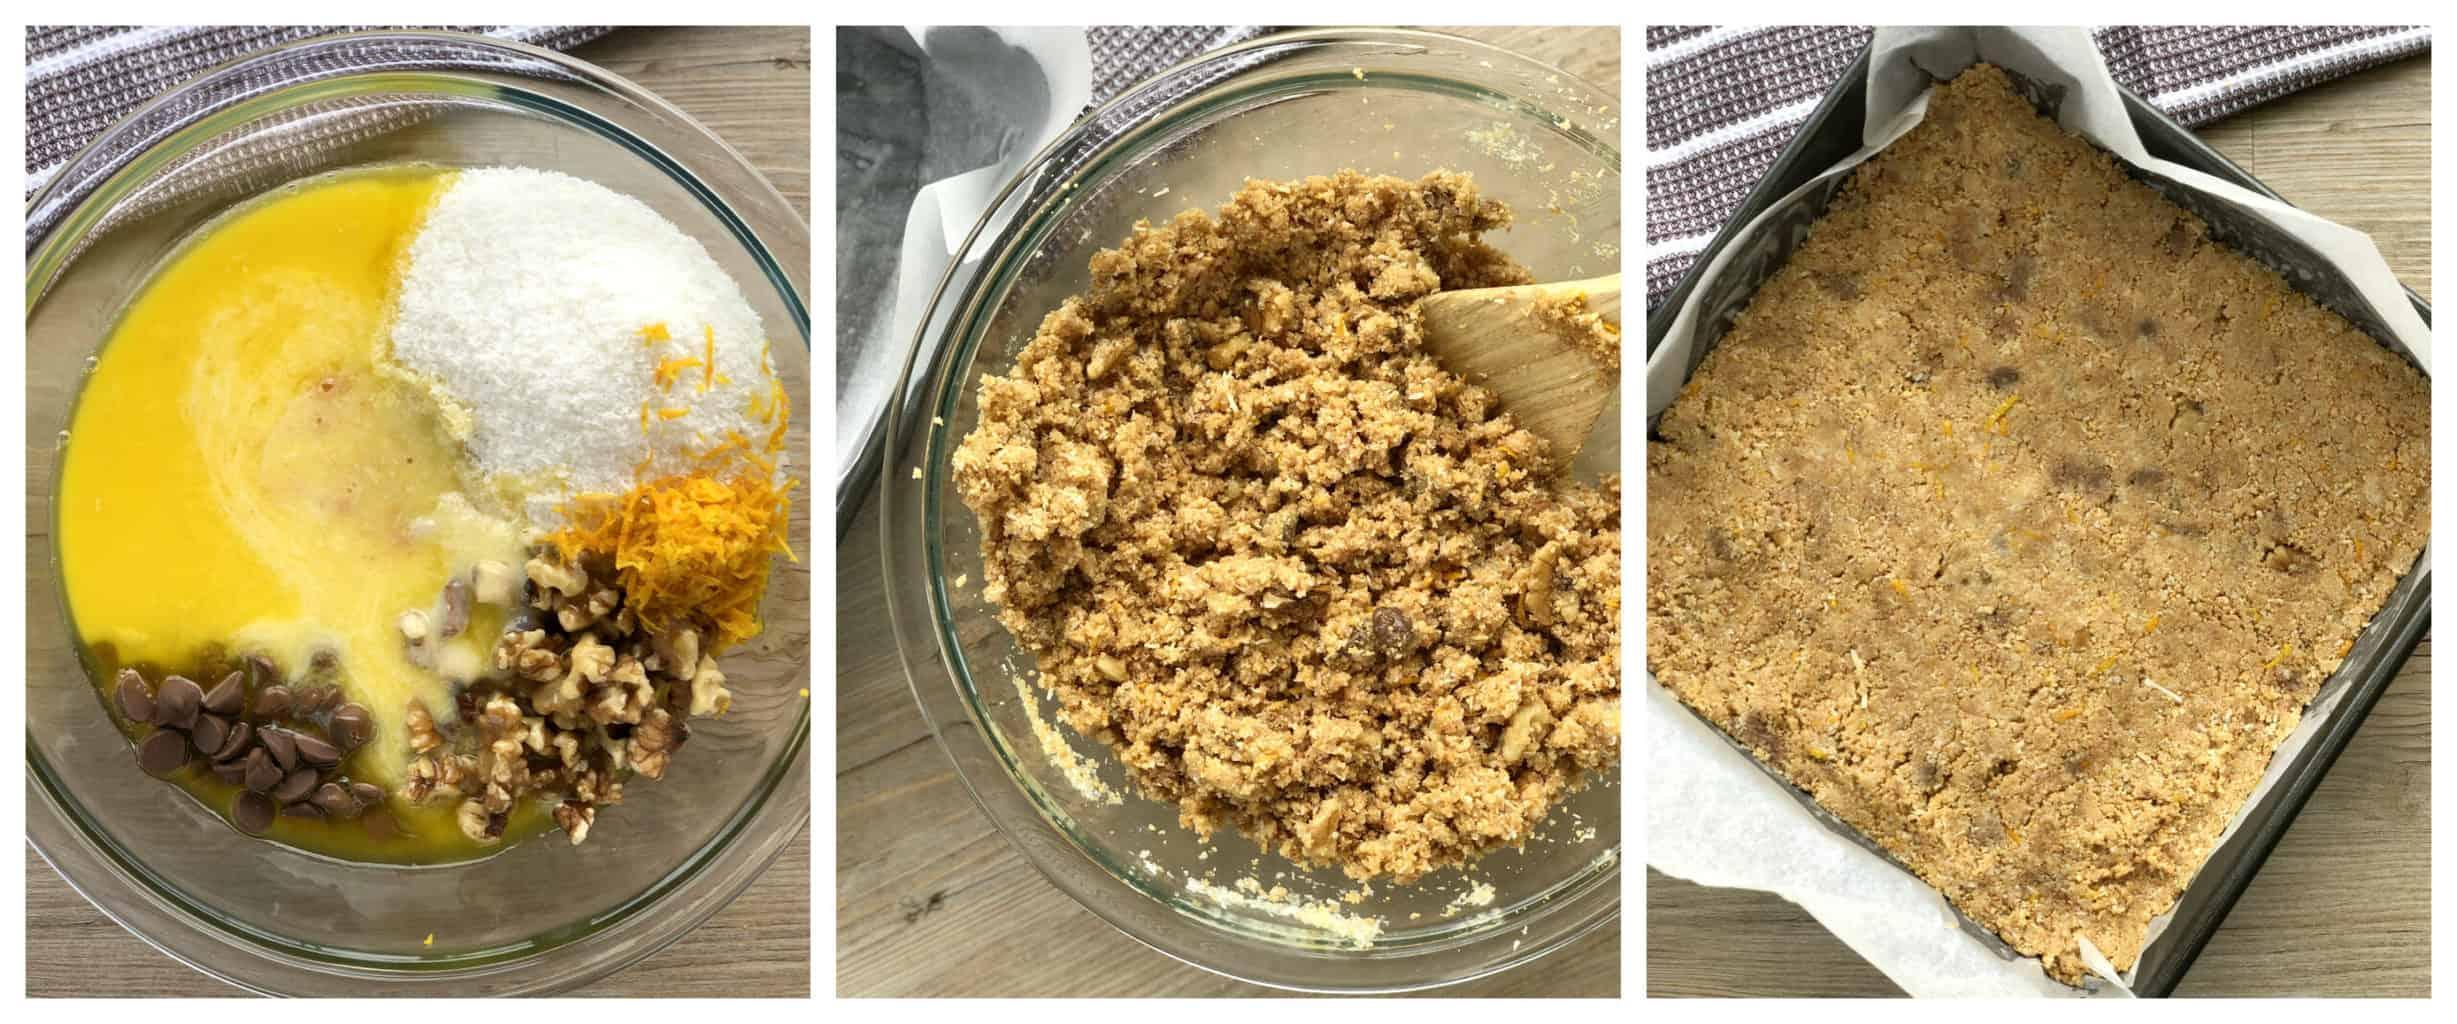 How to make Orange Coconut Biscuit Slice